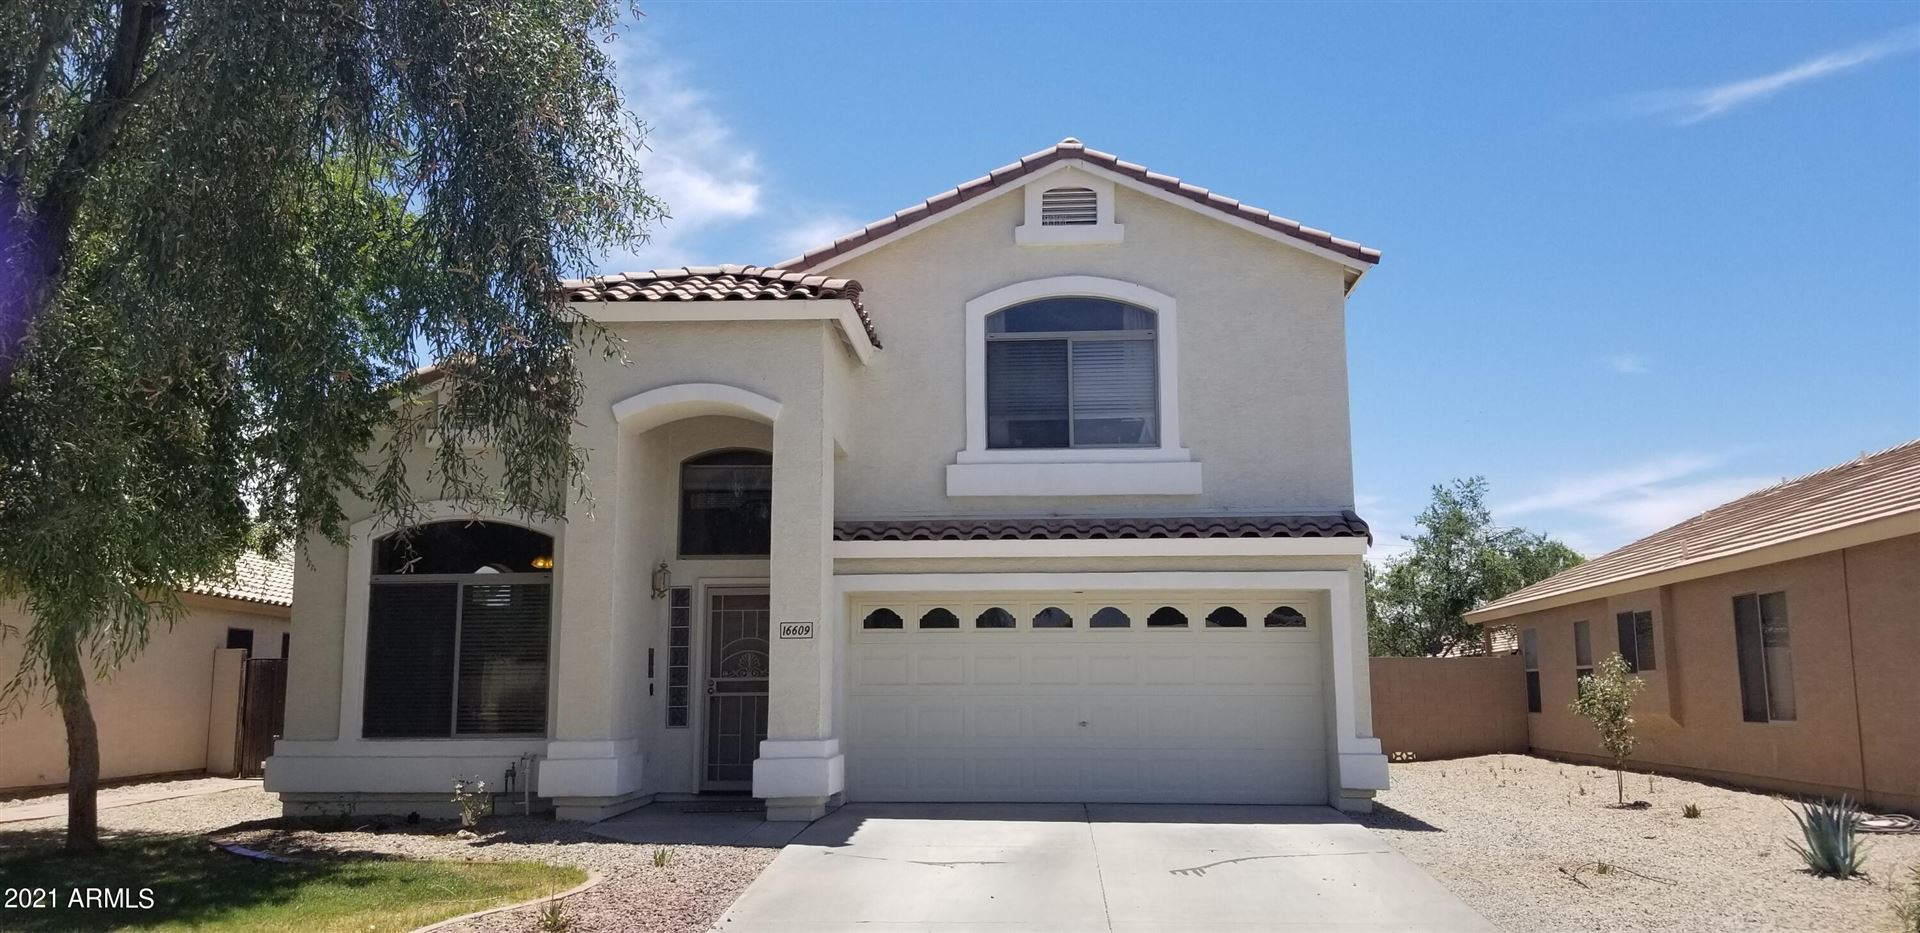 Photo of 16609 W POLK Street, Goodyear, AZ 85338 (MLS # 6248868)